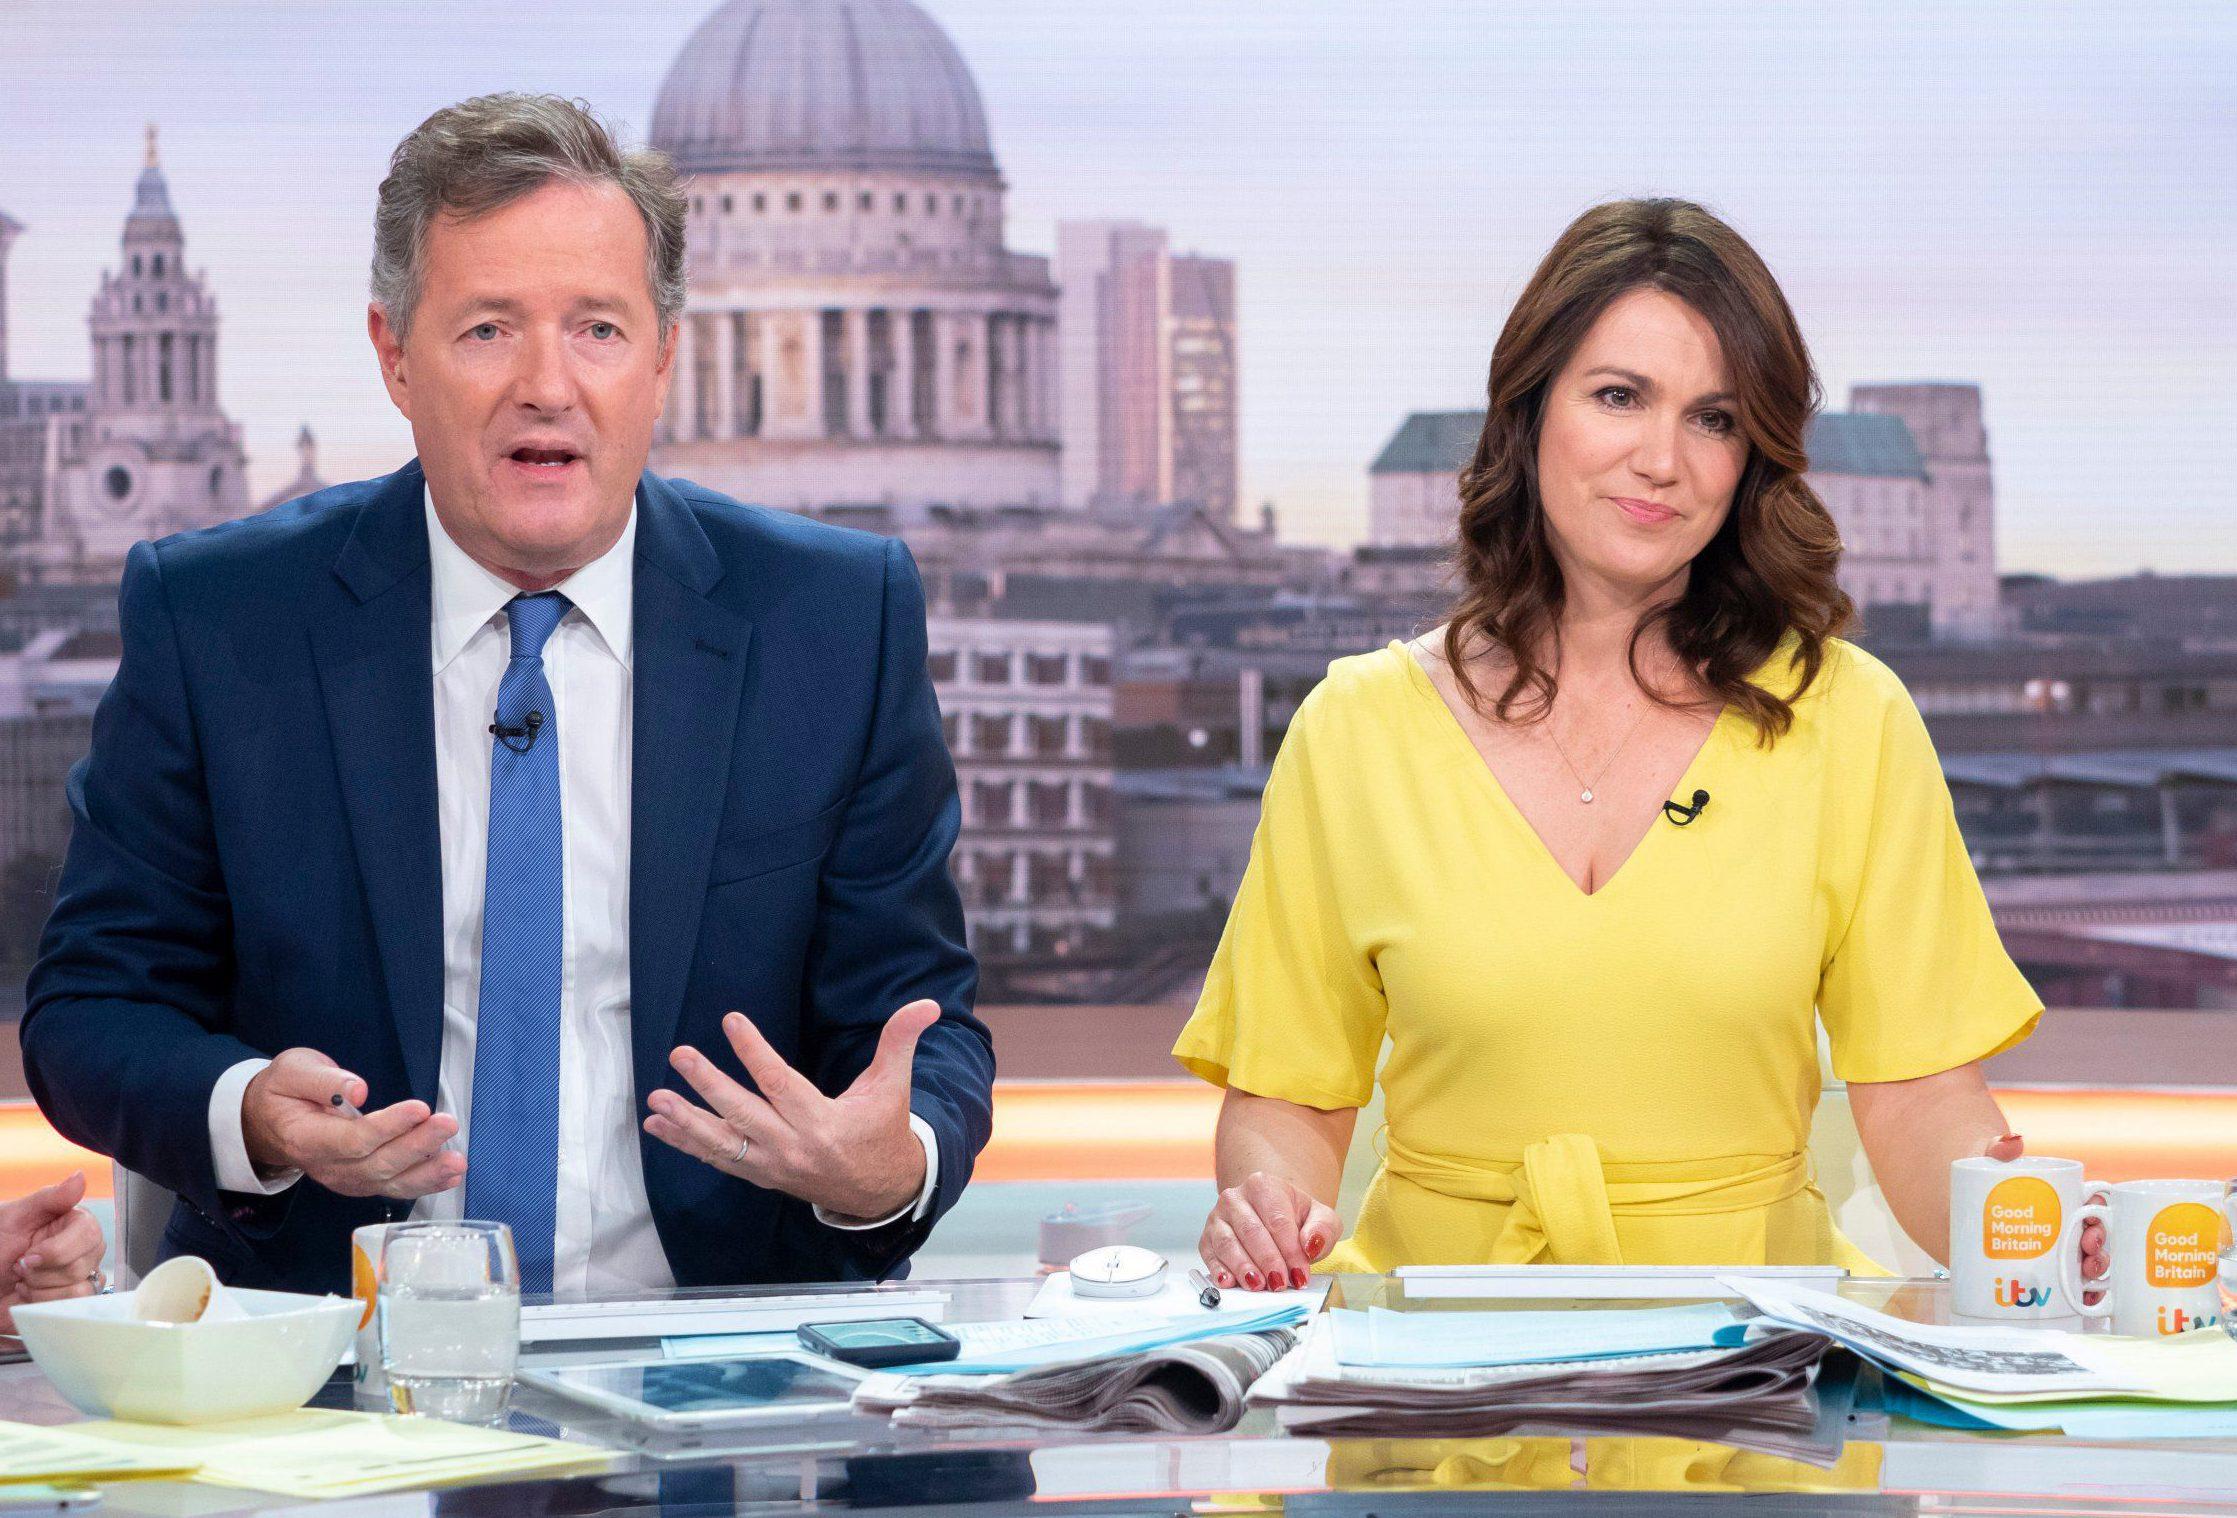 EDITORIAL USE ONLY. NO MERCHANDISING Mandatory Credit: Photo by Ken McKay/ITV/REX/Shutterstock (9727533x) Piers Morgan, Susanna Reid 'Good Morning Britain' TV show, London, UK - 26 Jun 2018